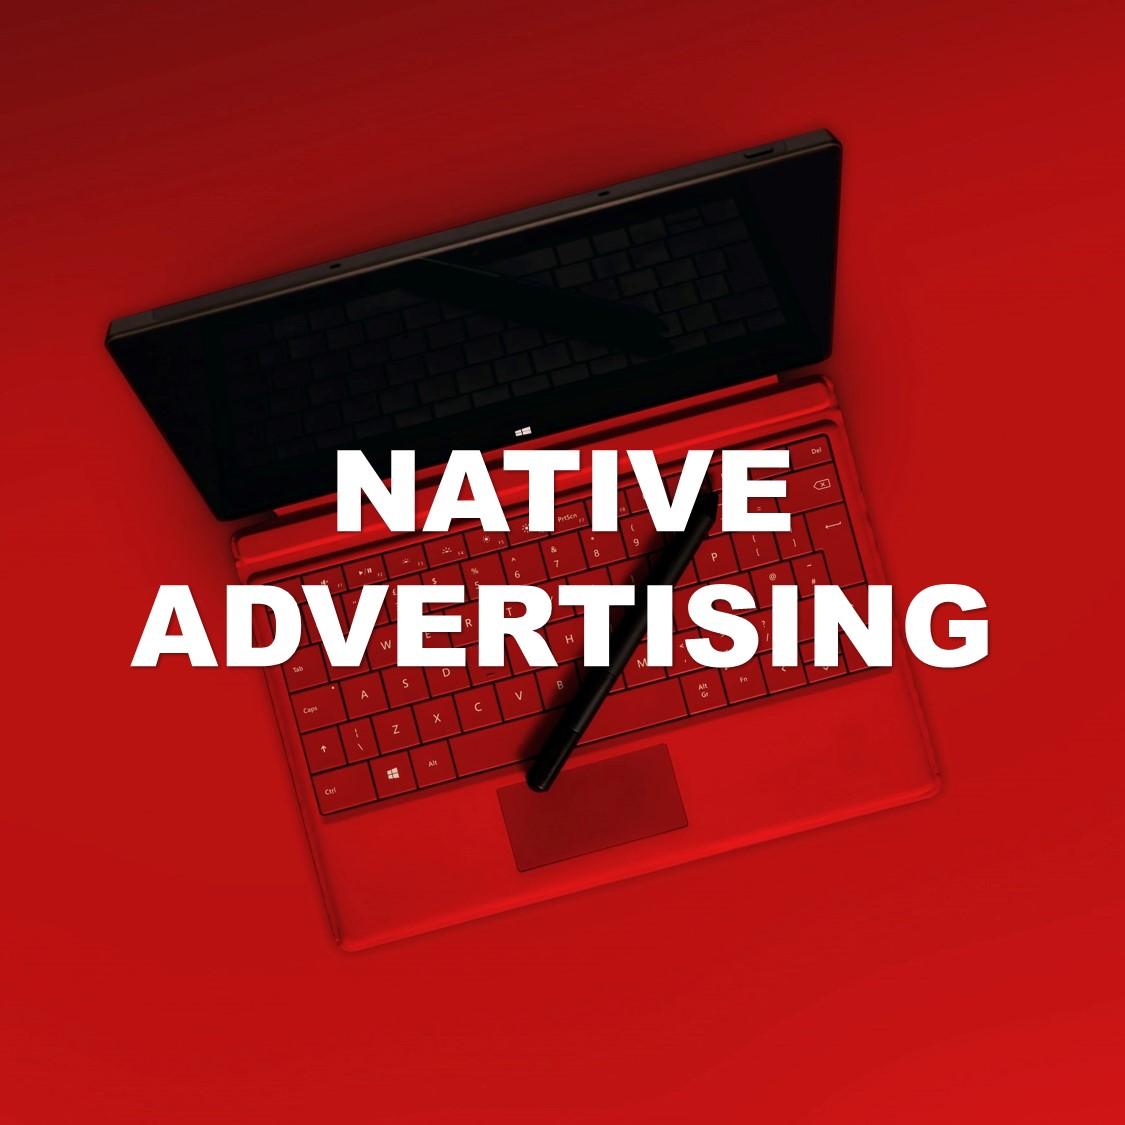 isl avenue advertising